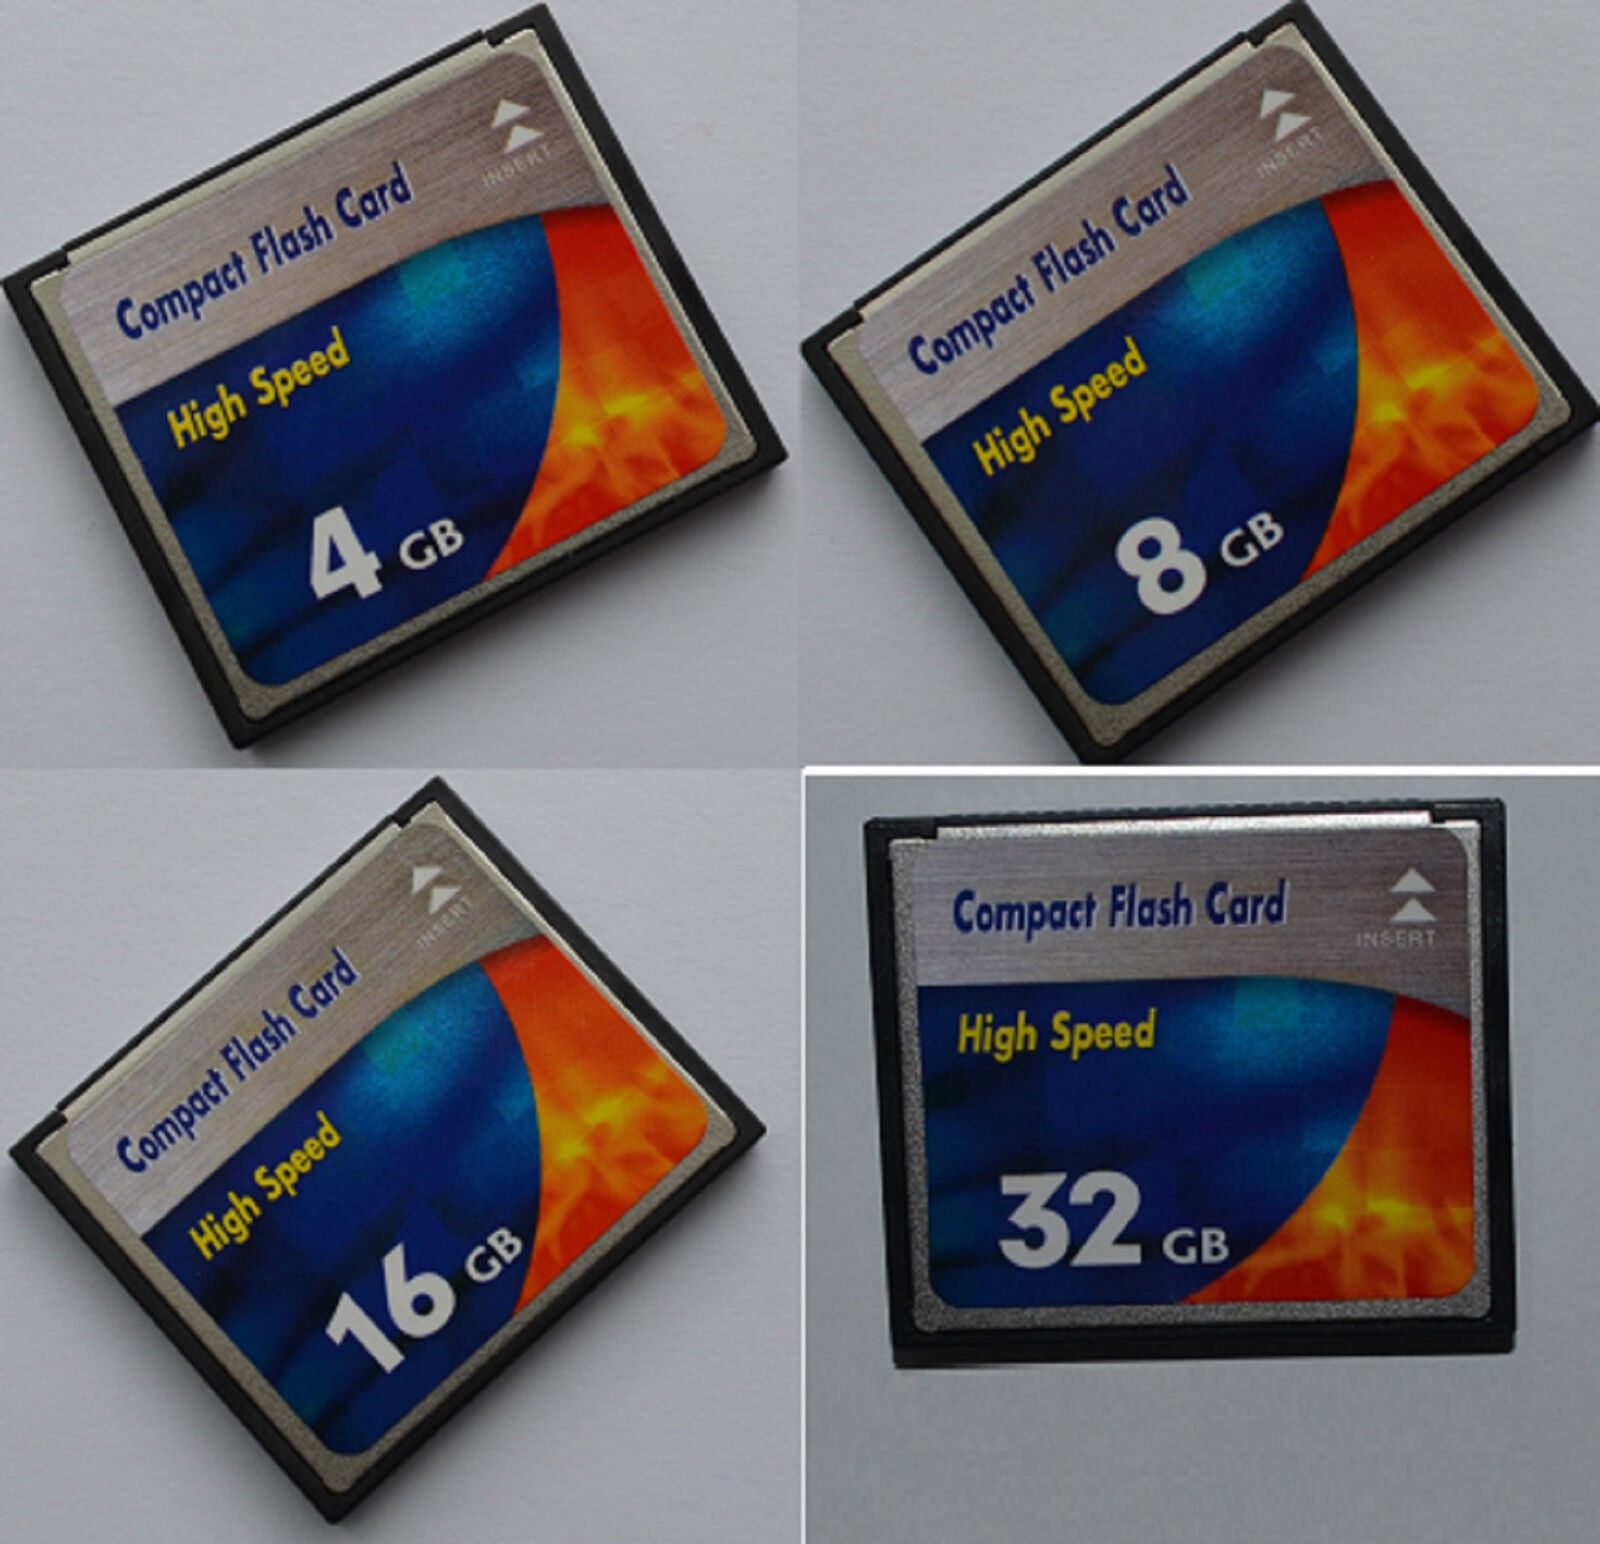 Compact Flash Karte.Speicherkarte Compact Flash Cf Karte 4 Gb 8 Gb 16 Gb 32 Gb Für Digital Kamera